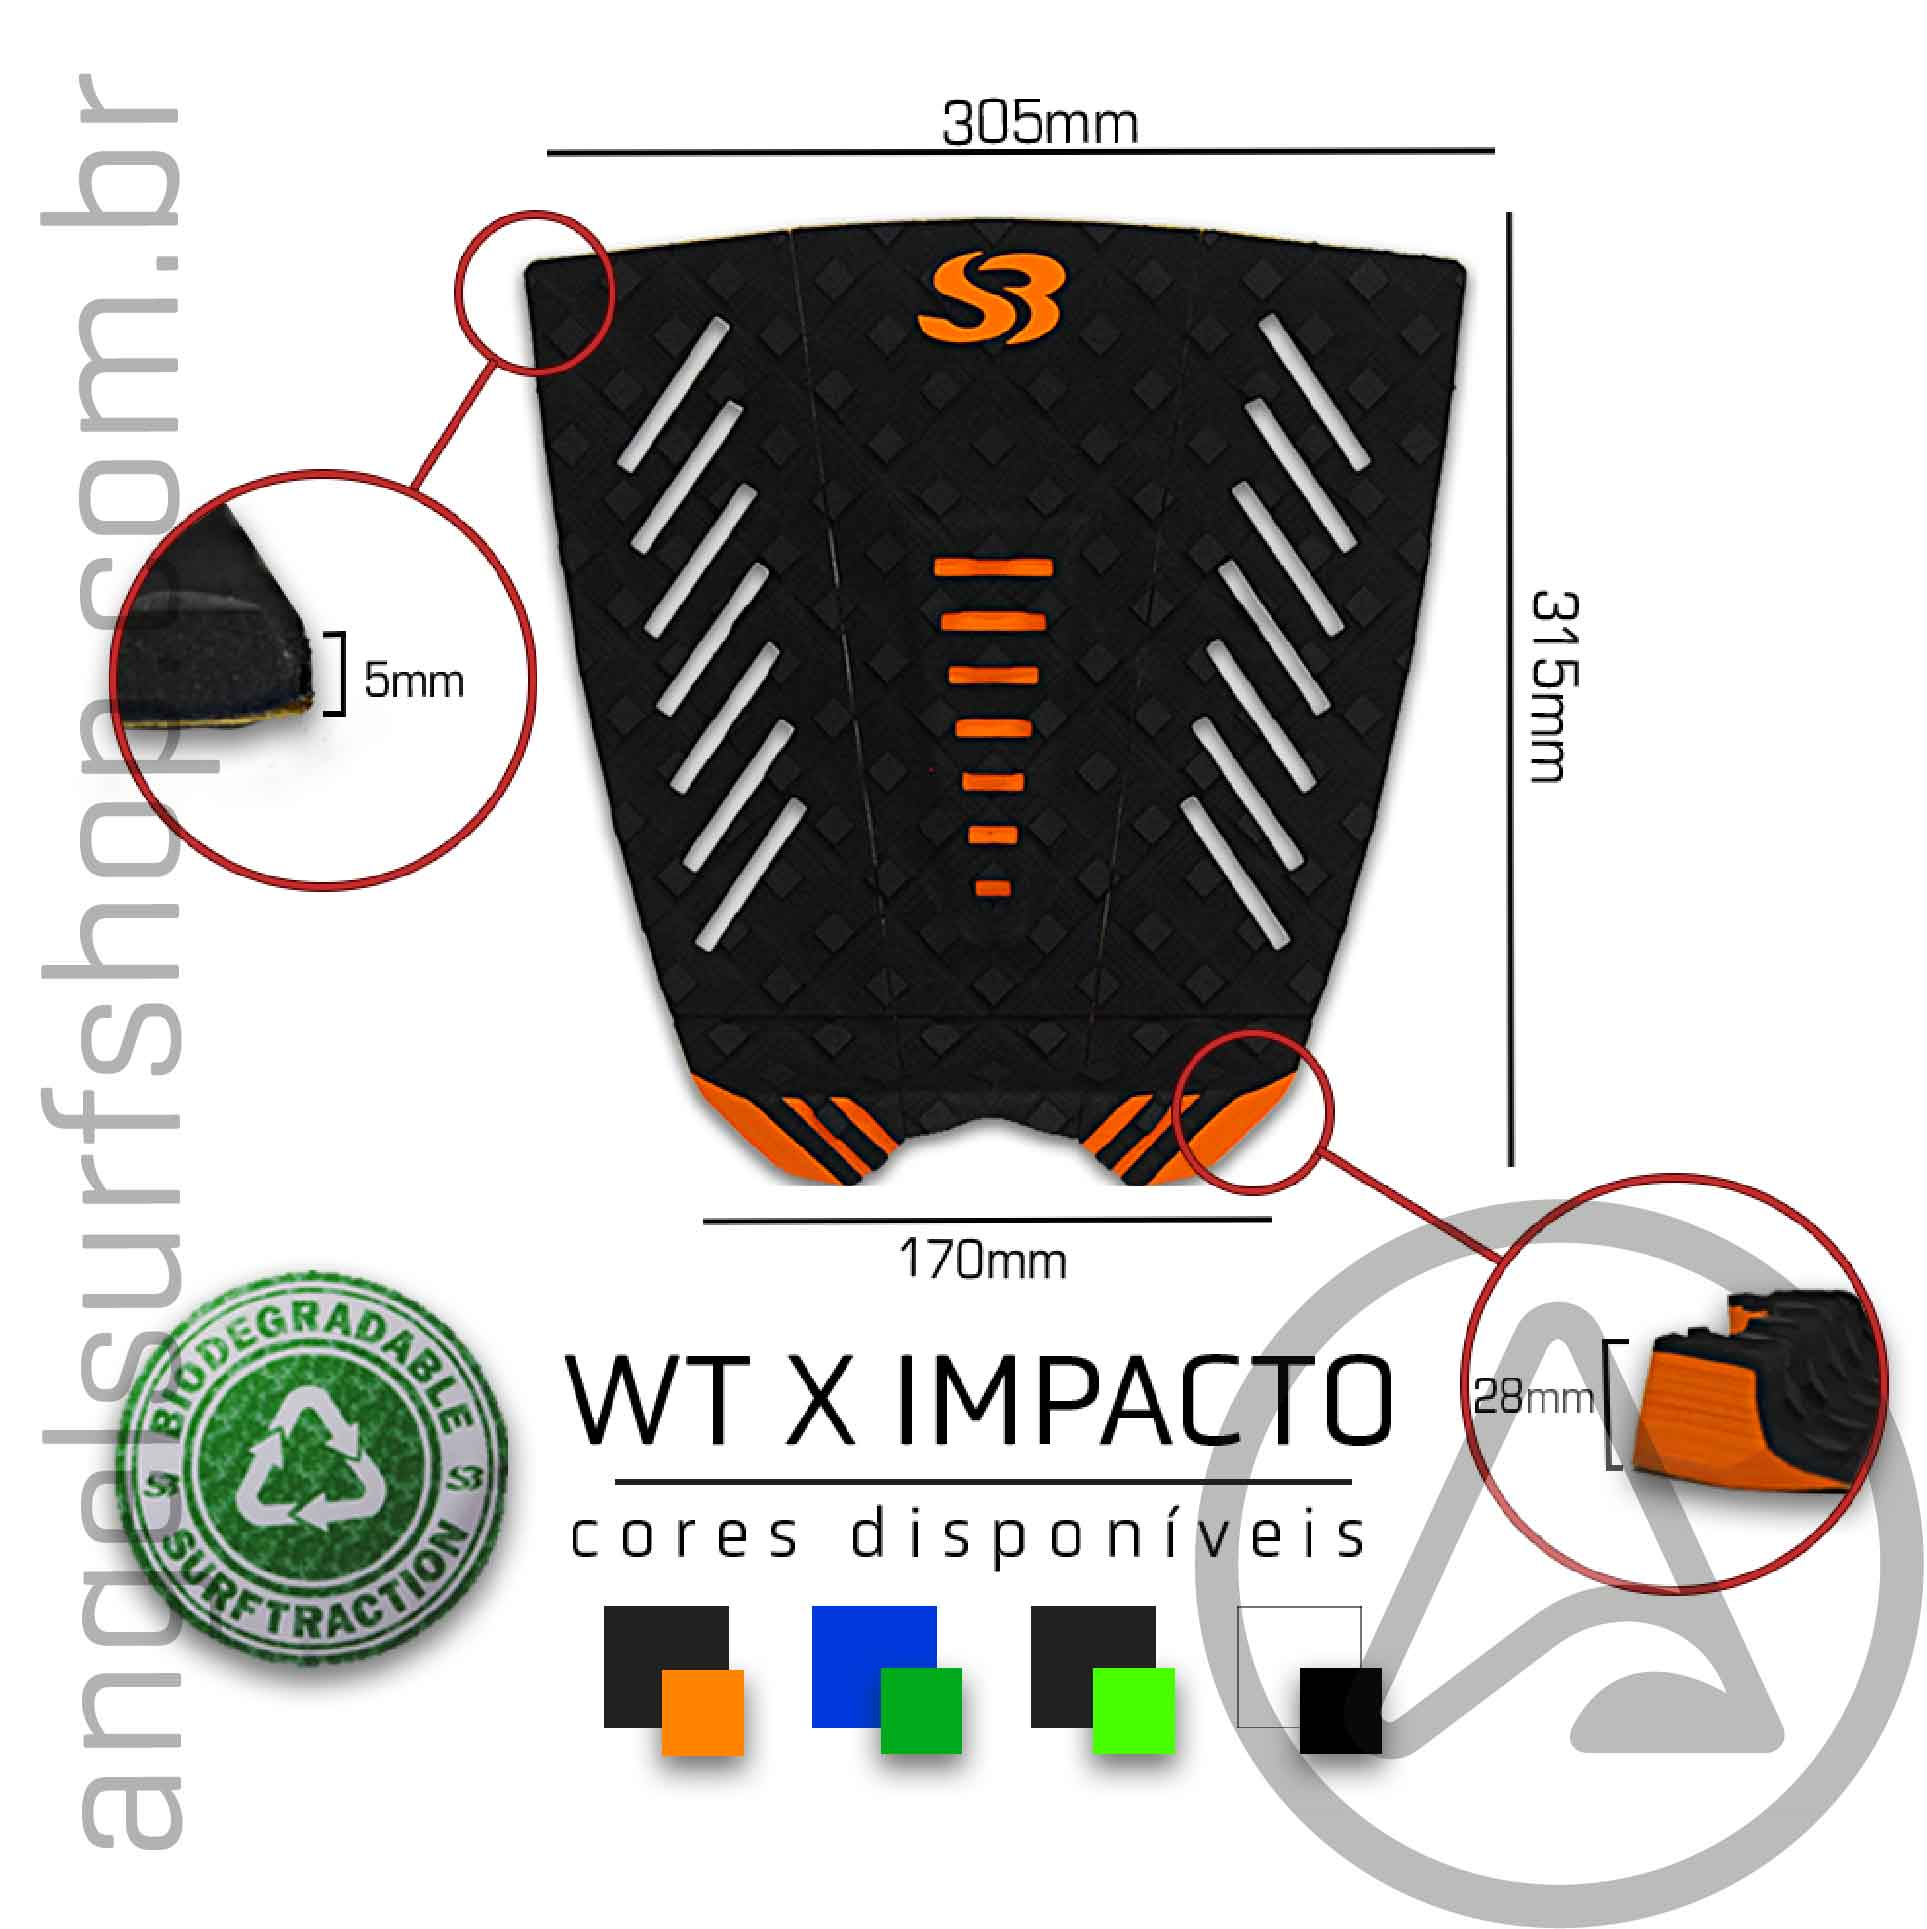 DECK SURF SILVERBAY WT X IMPACTO